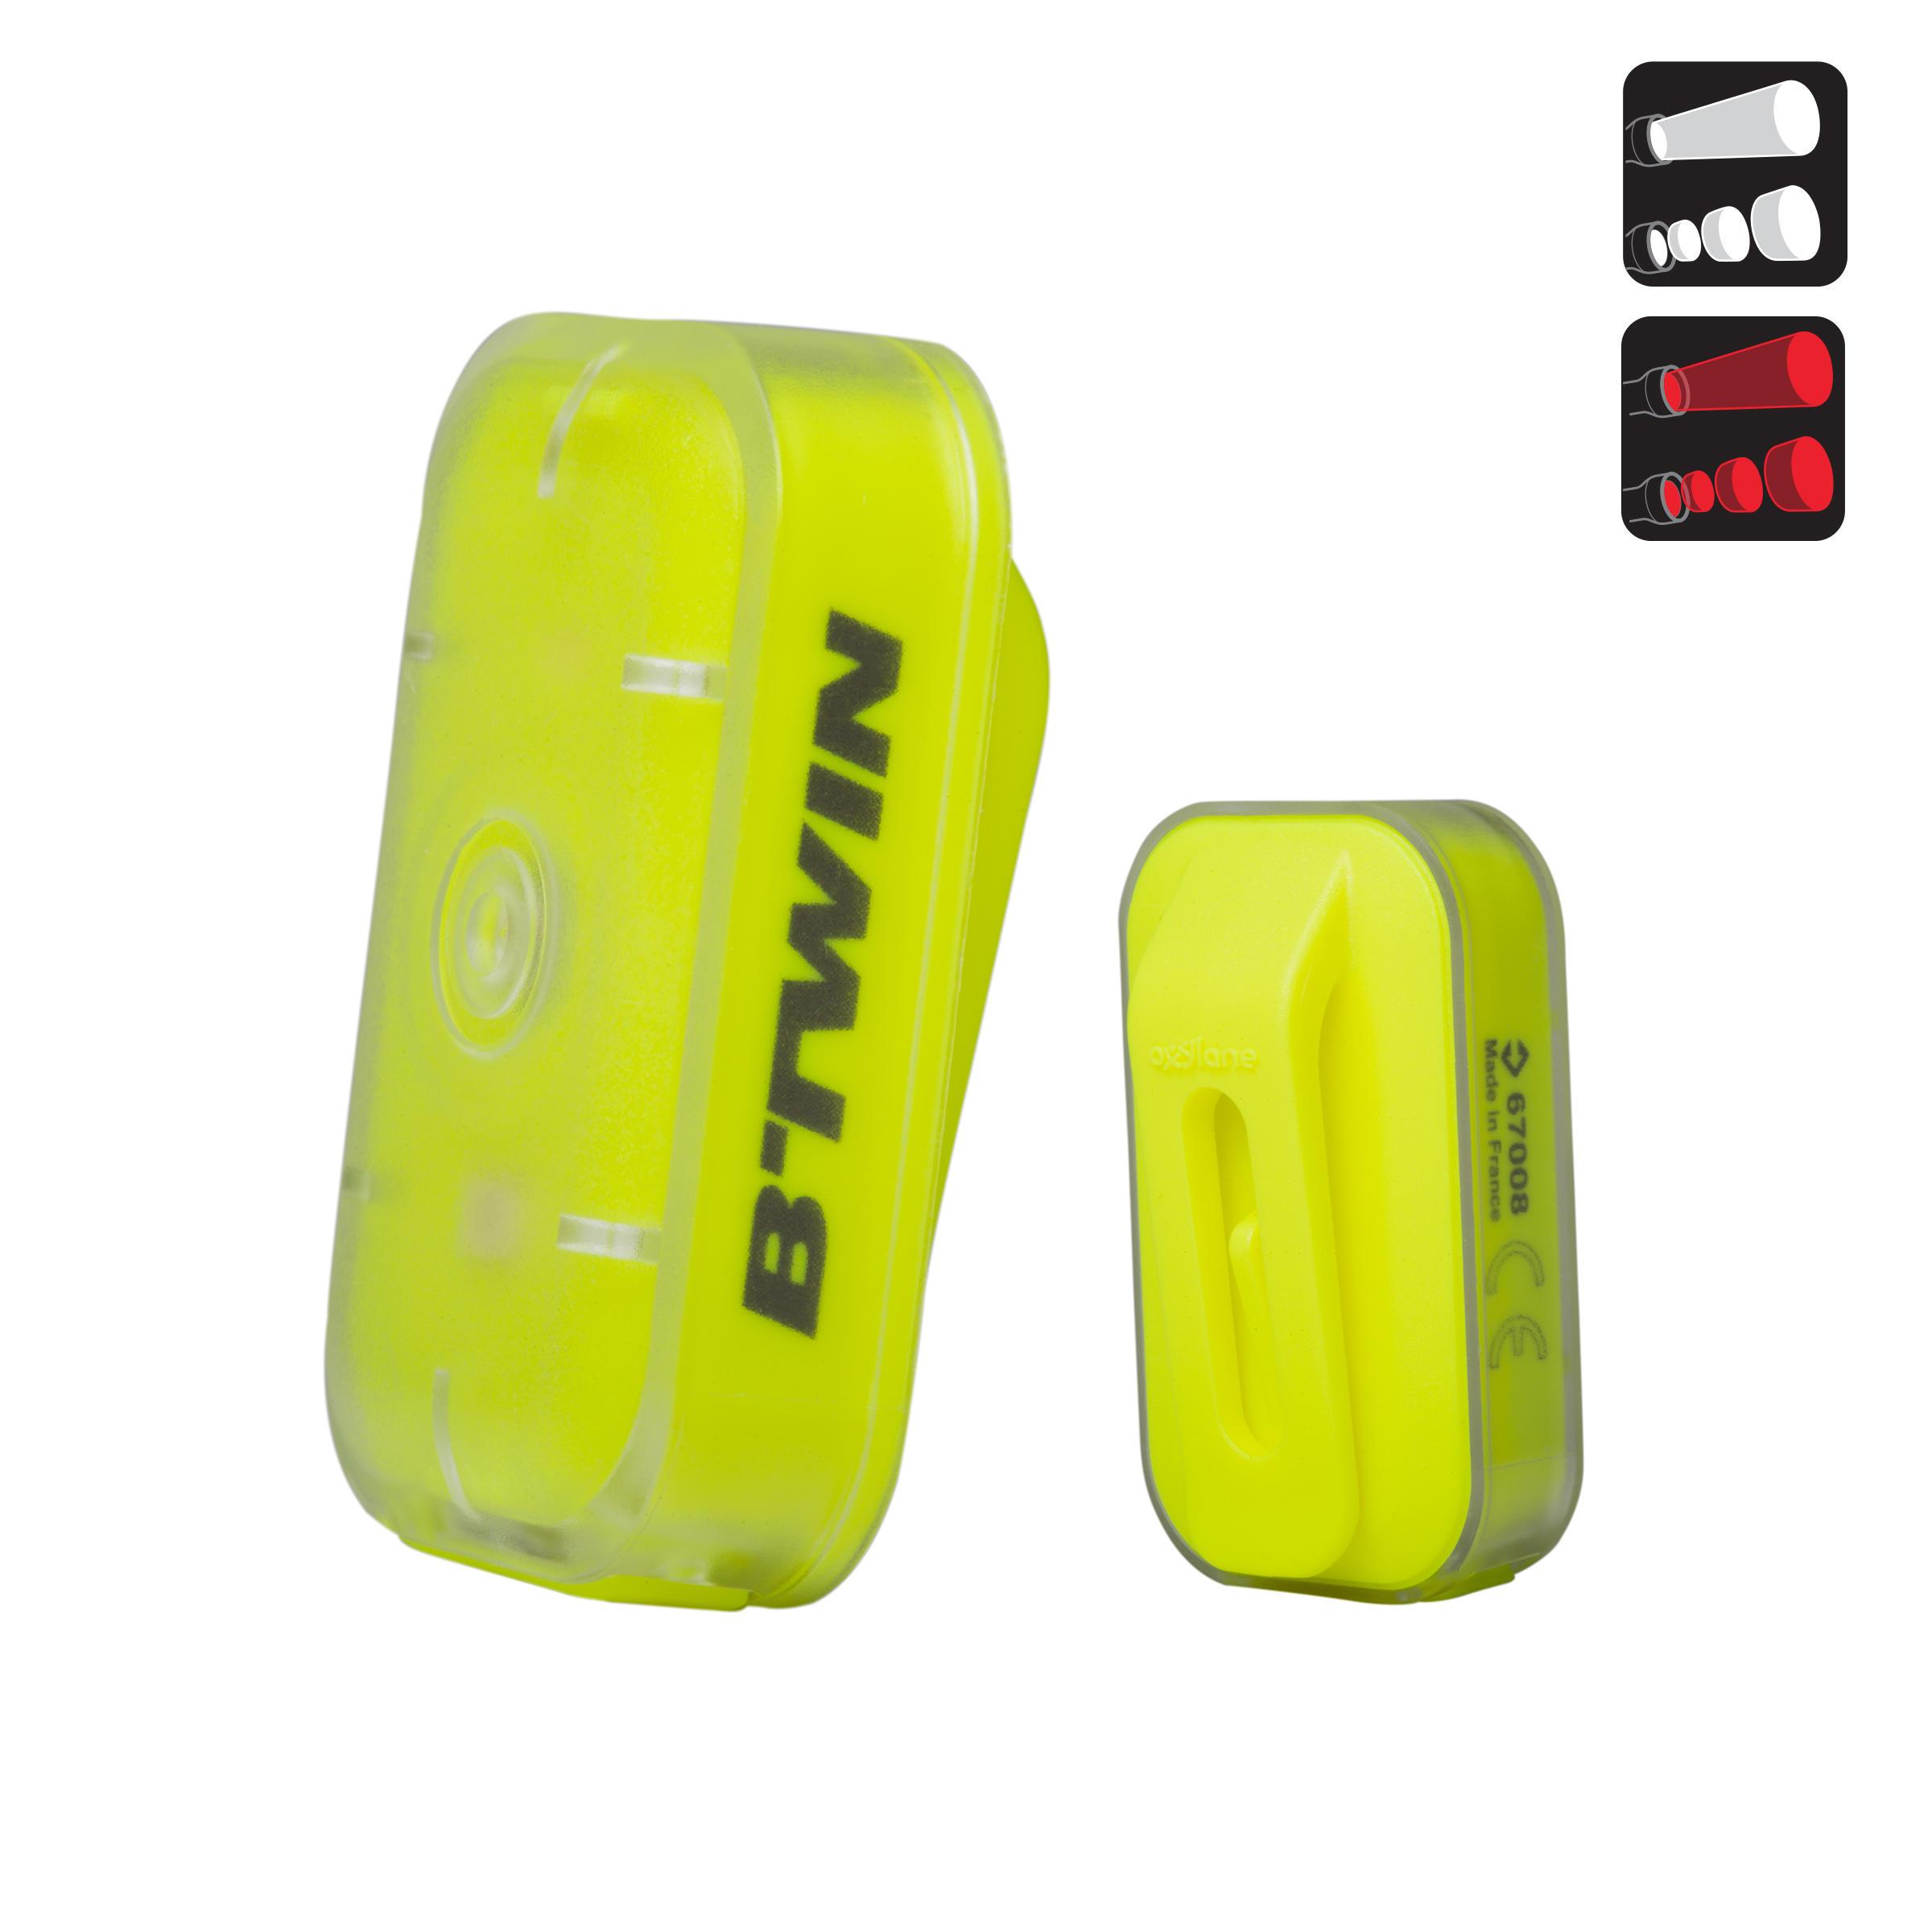 Vioo Clip 500 LED Bike Light - Yellow